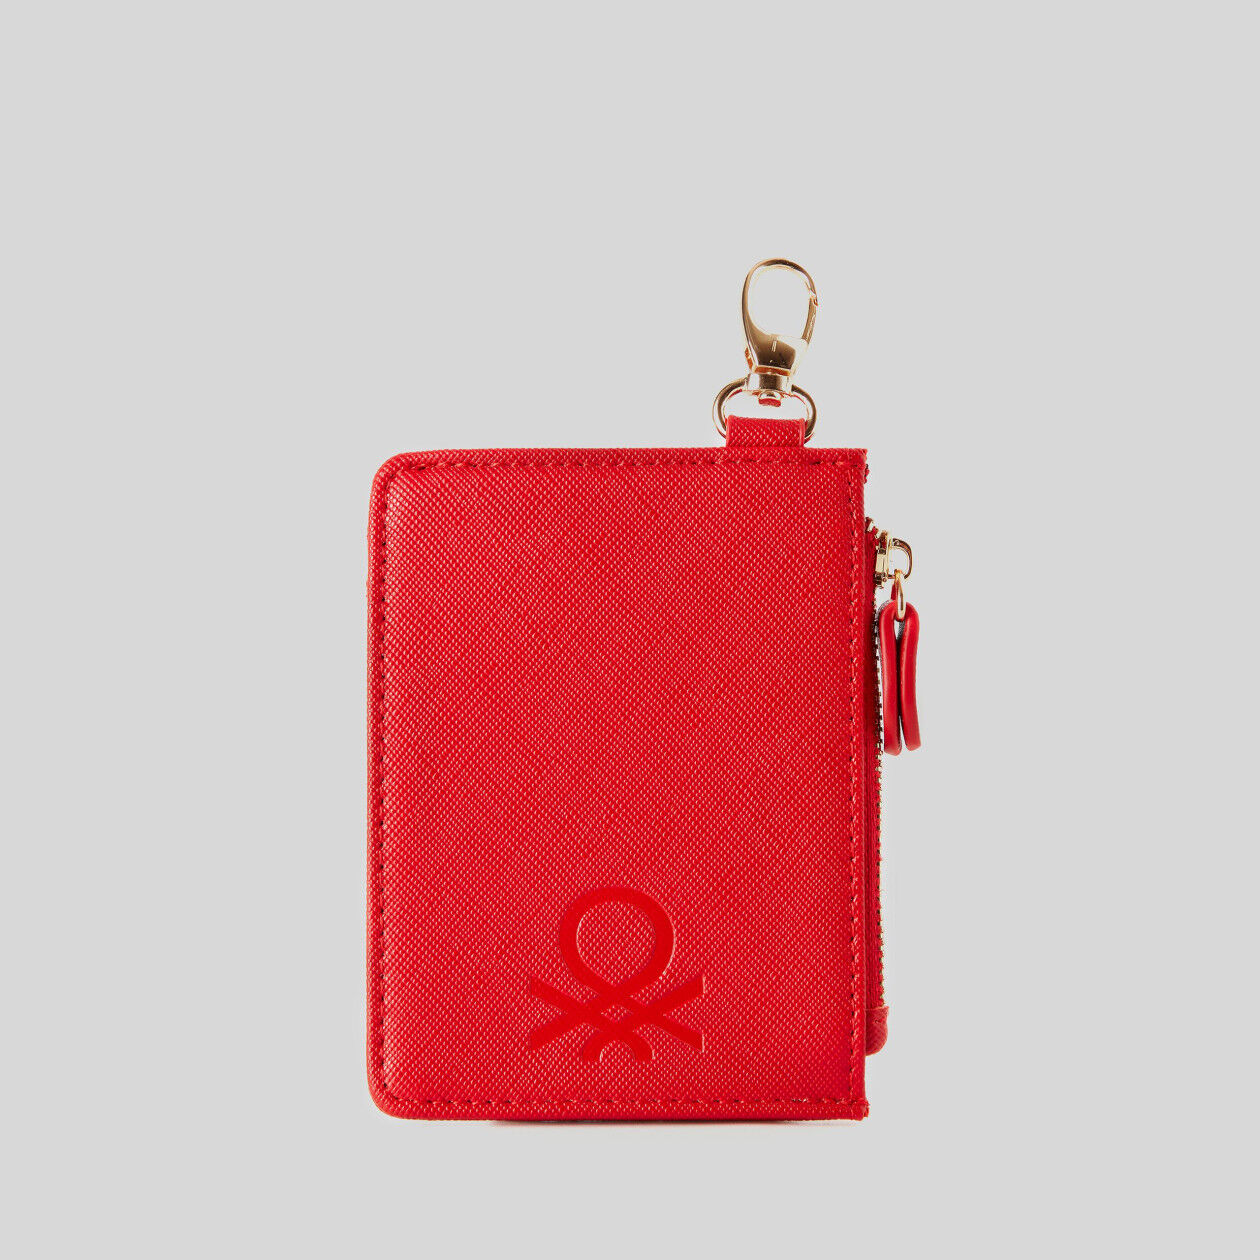 Porte-cartes avec porte-clés